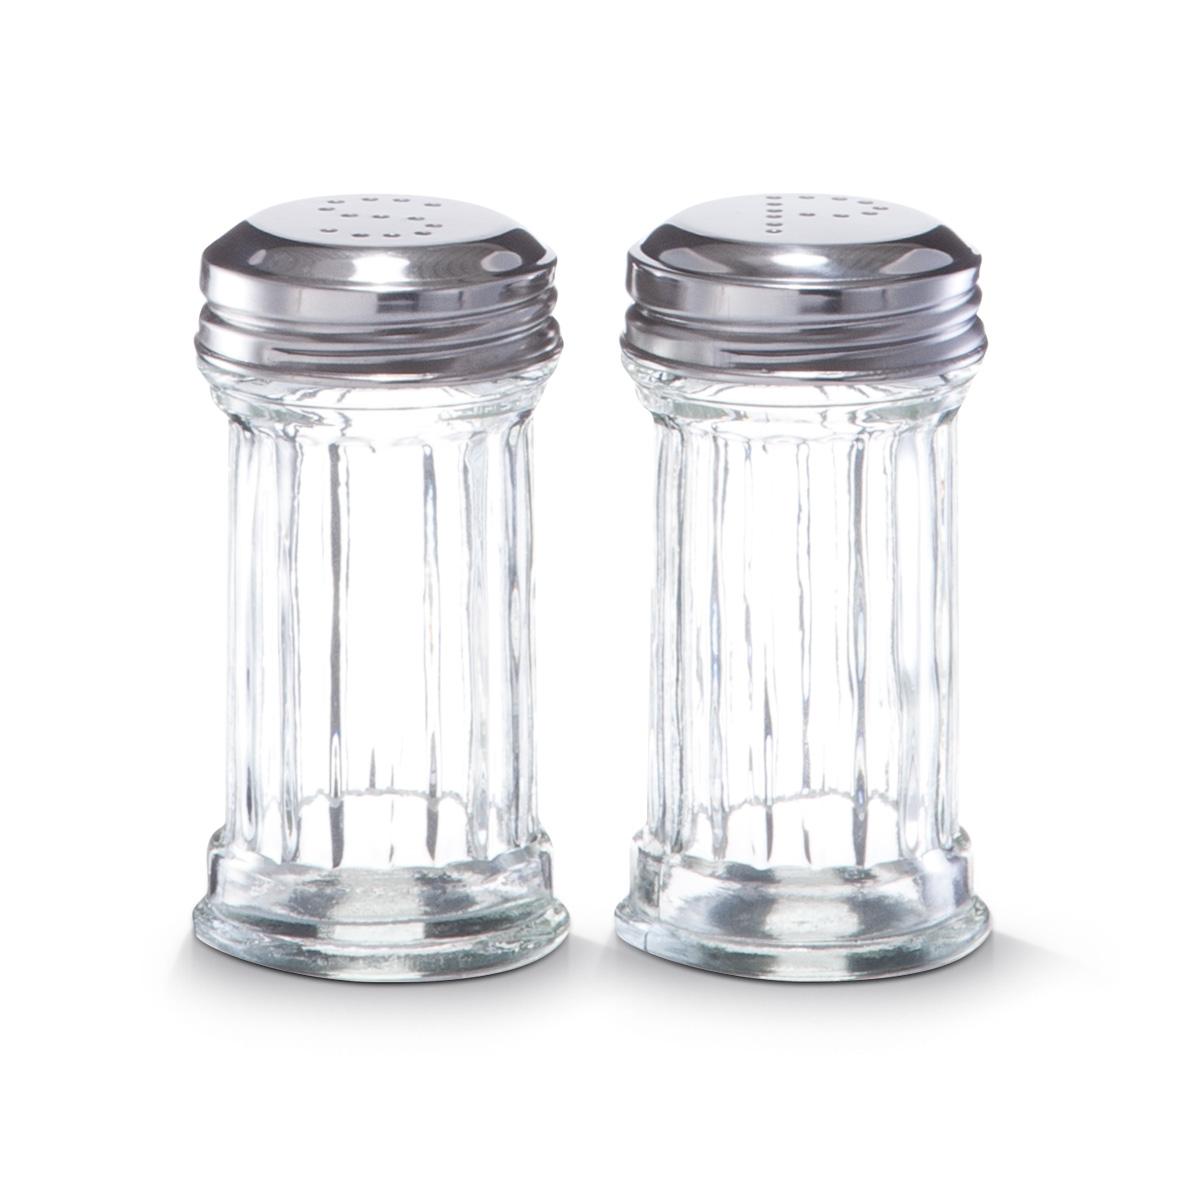 Set solnita si pipernita S&P, sticla si inox, 60 ml, Ø 5xH9,5 cm